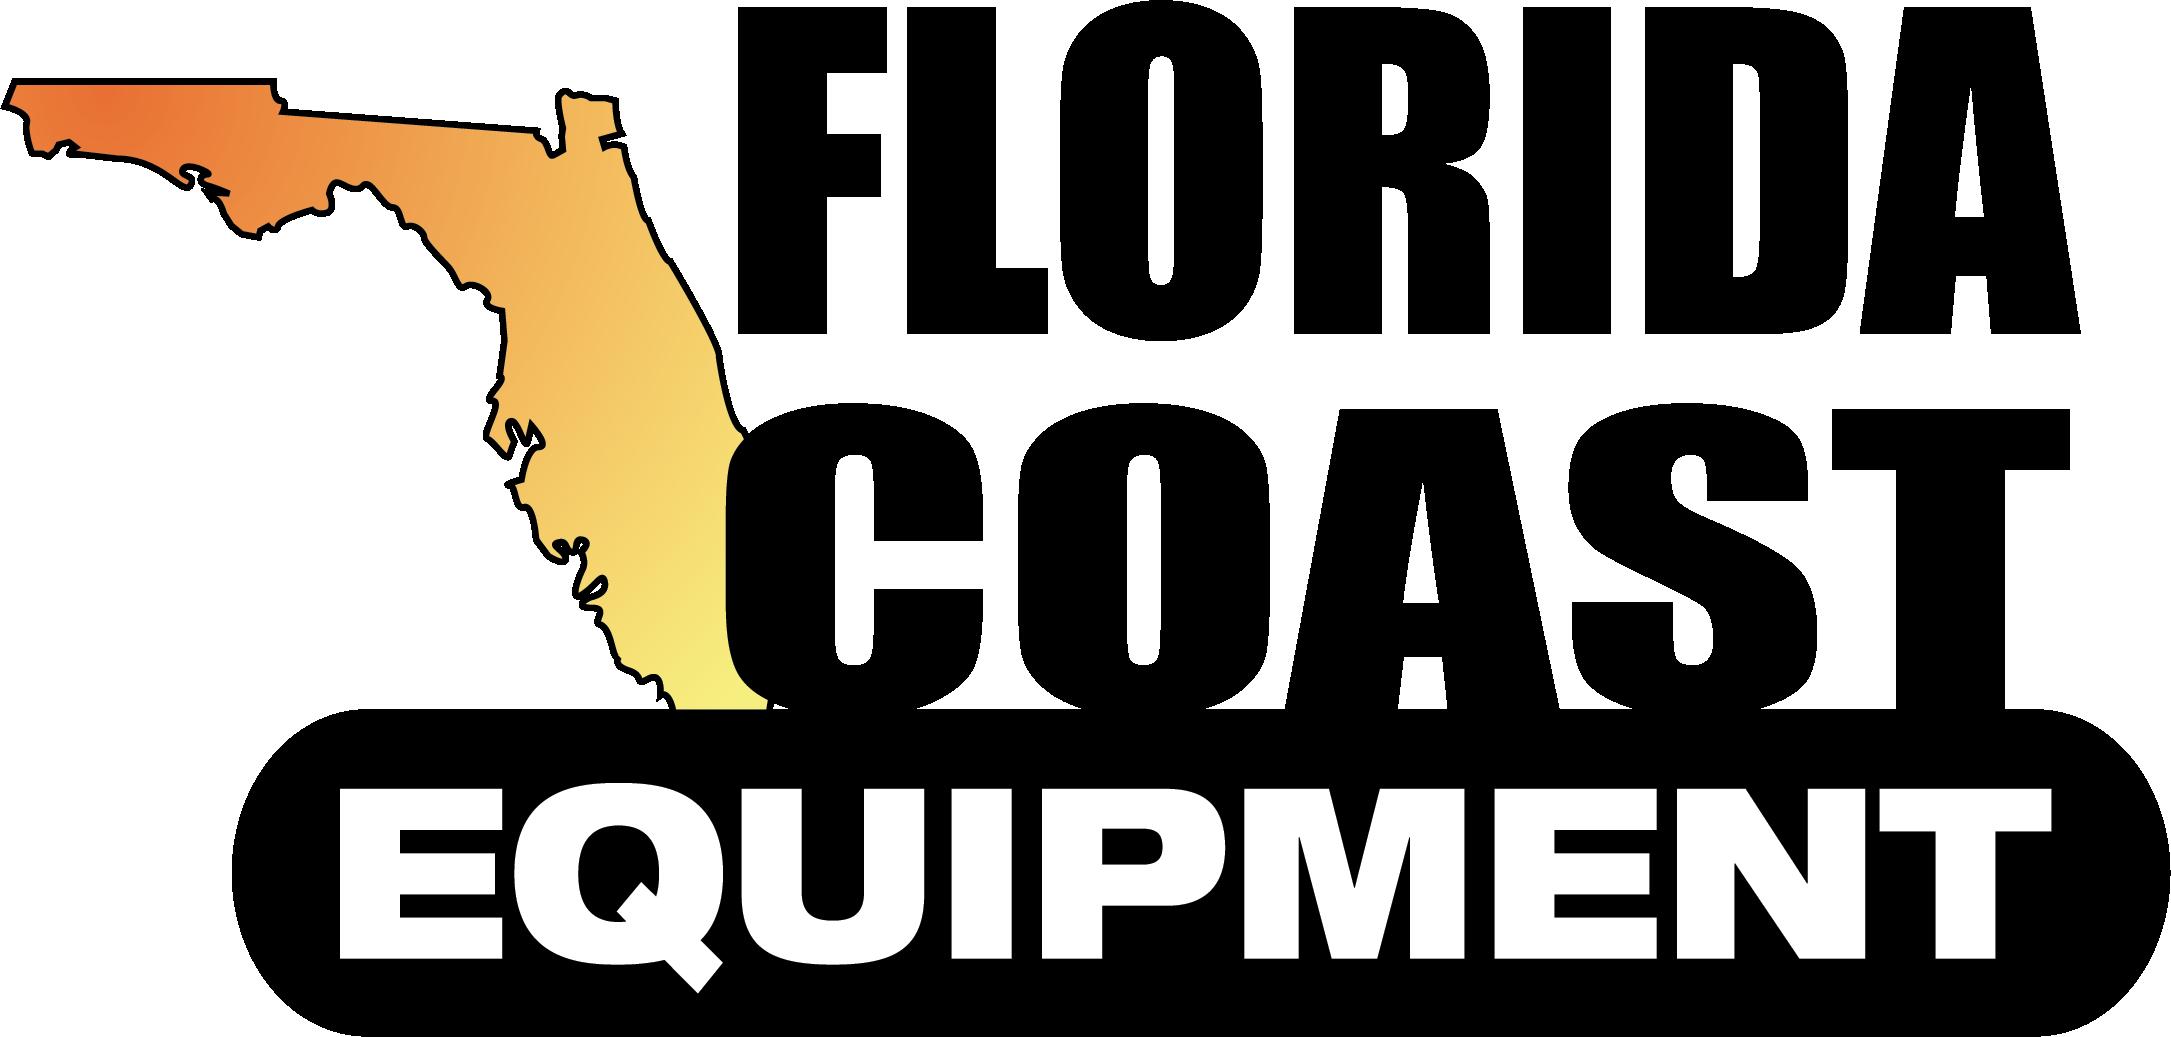 Florida Coast Equipment company logo